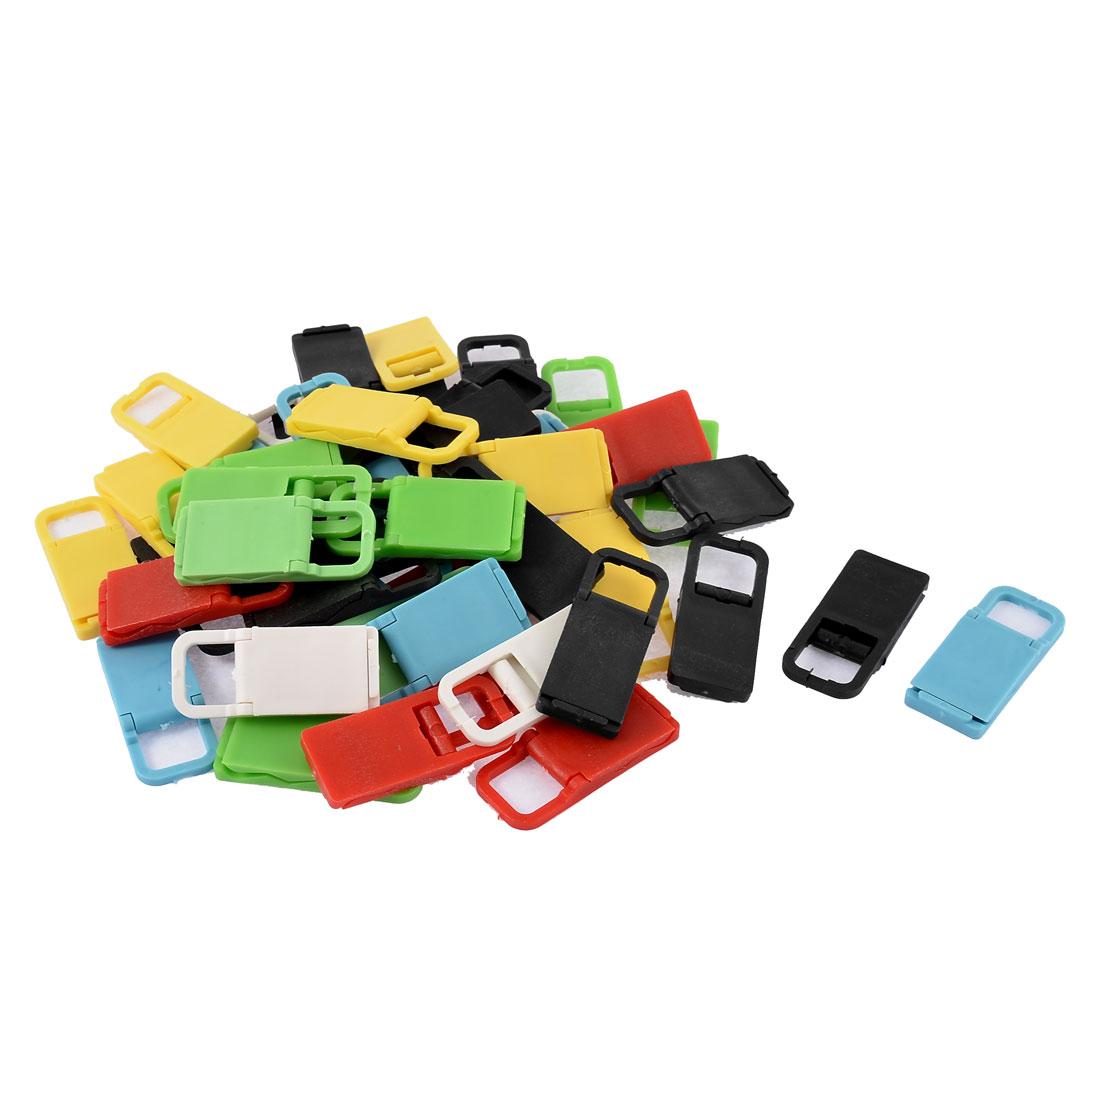 50pcs Multicolor Plastic Foldable Desktop Tablet Mobile Phone Holder Stand Support